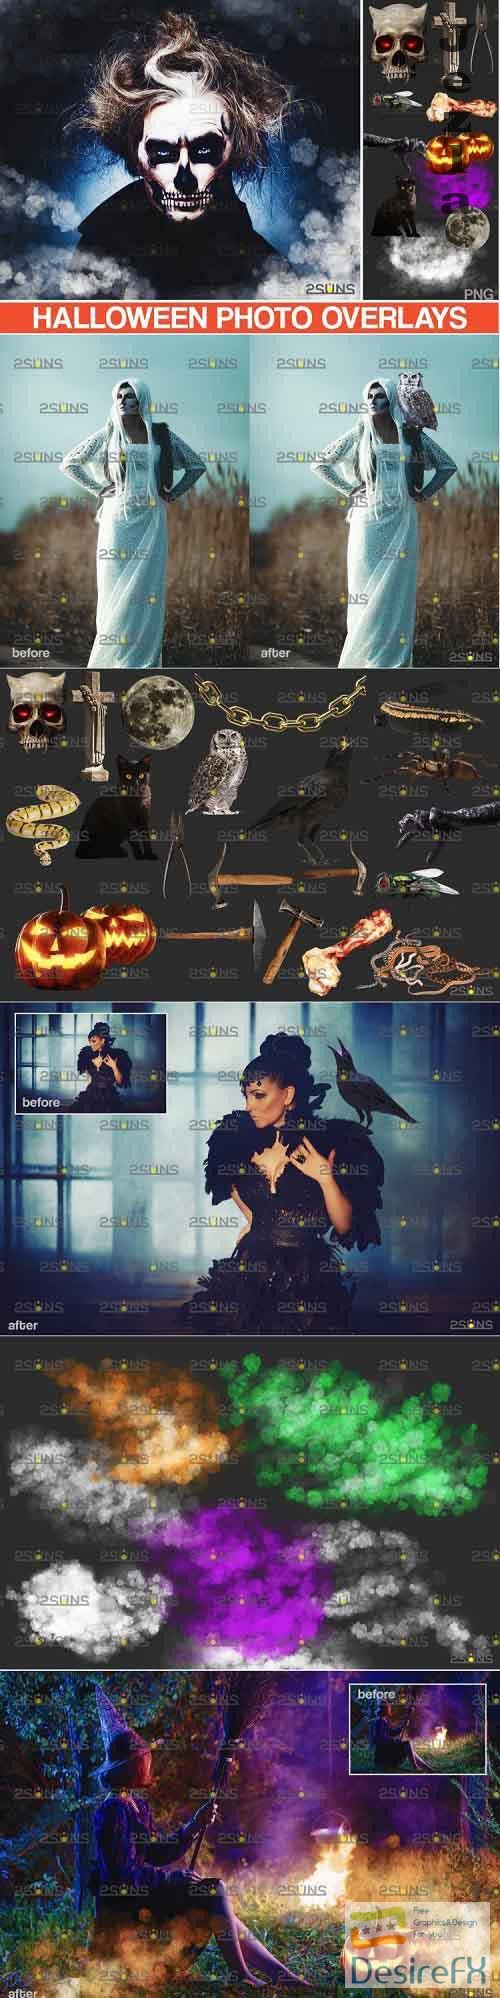 Photoshop overlay & Halloween clipart pumpkin clipart - 895371